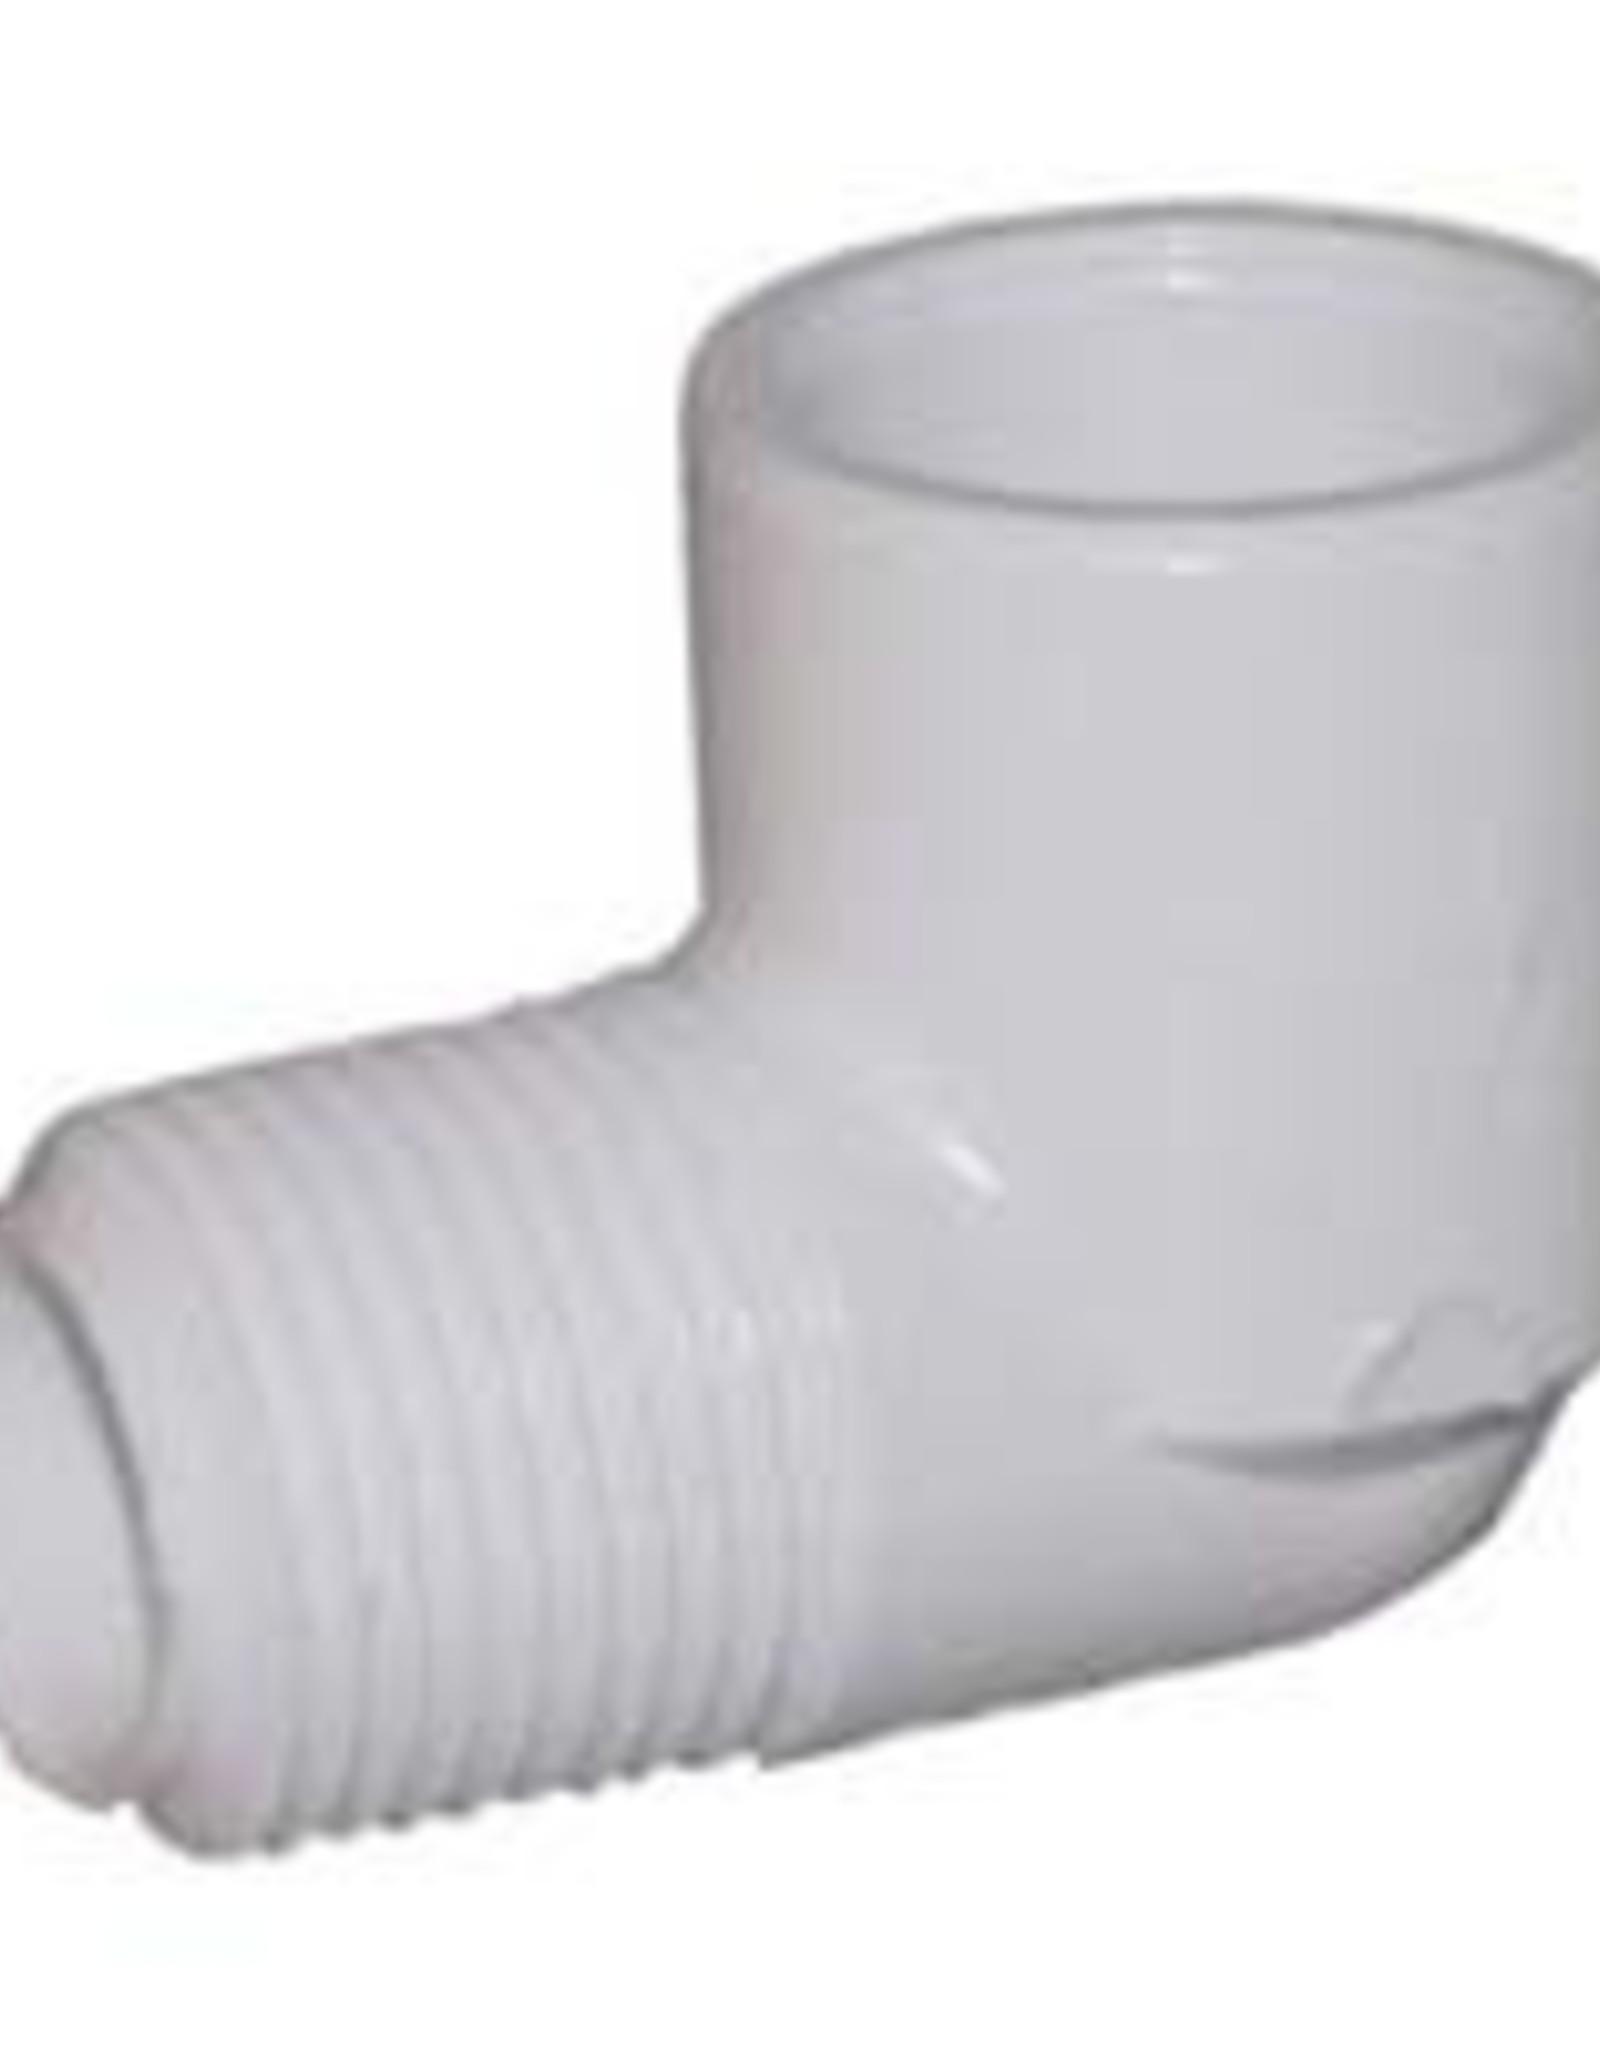 "Lasco Fittings PVC 1"" Street Elbow Slip x MPT SCH 40"